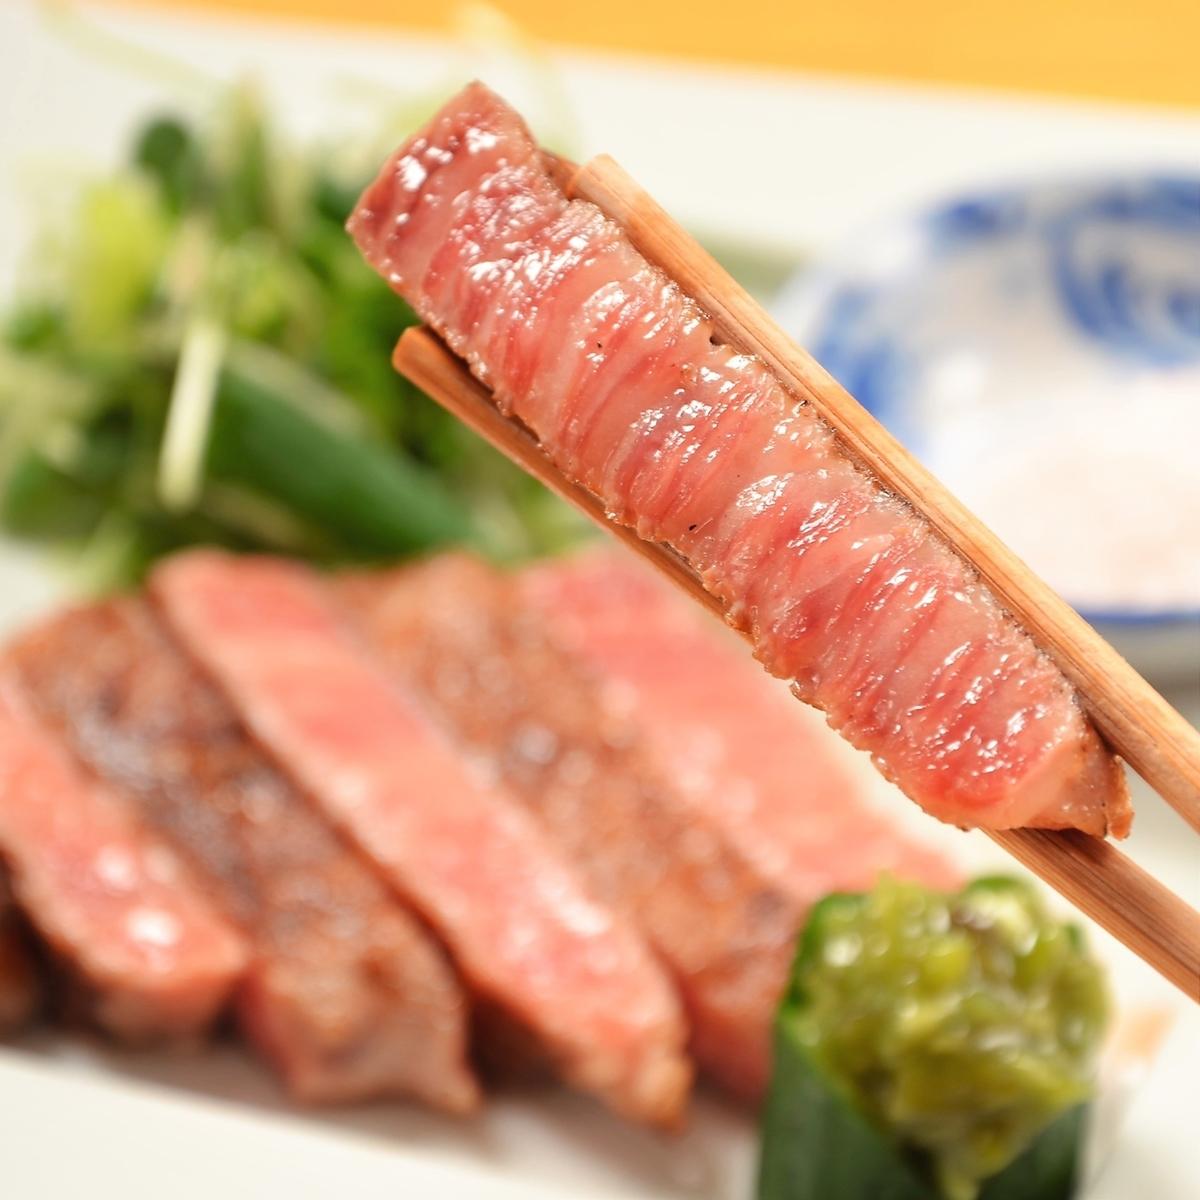 Kyushu Kuroge Wagyu Beef Broiled Broiler - rock salt and chopped Wasabi -